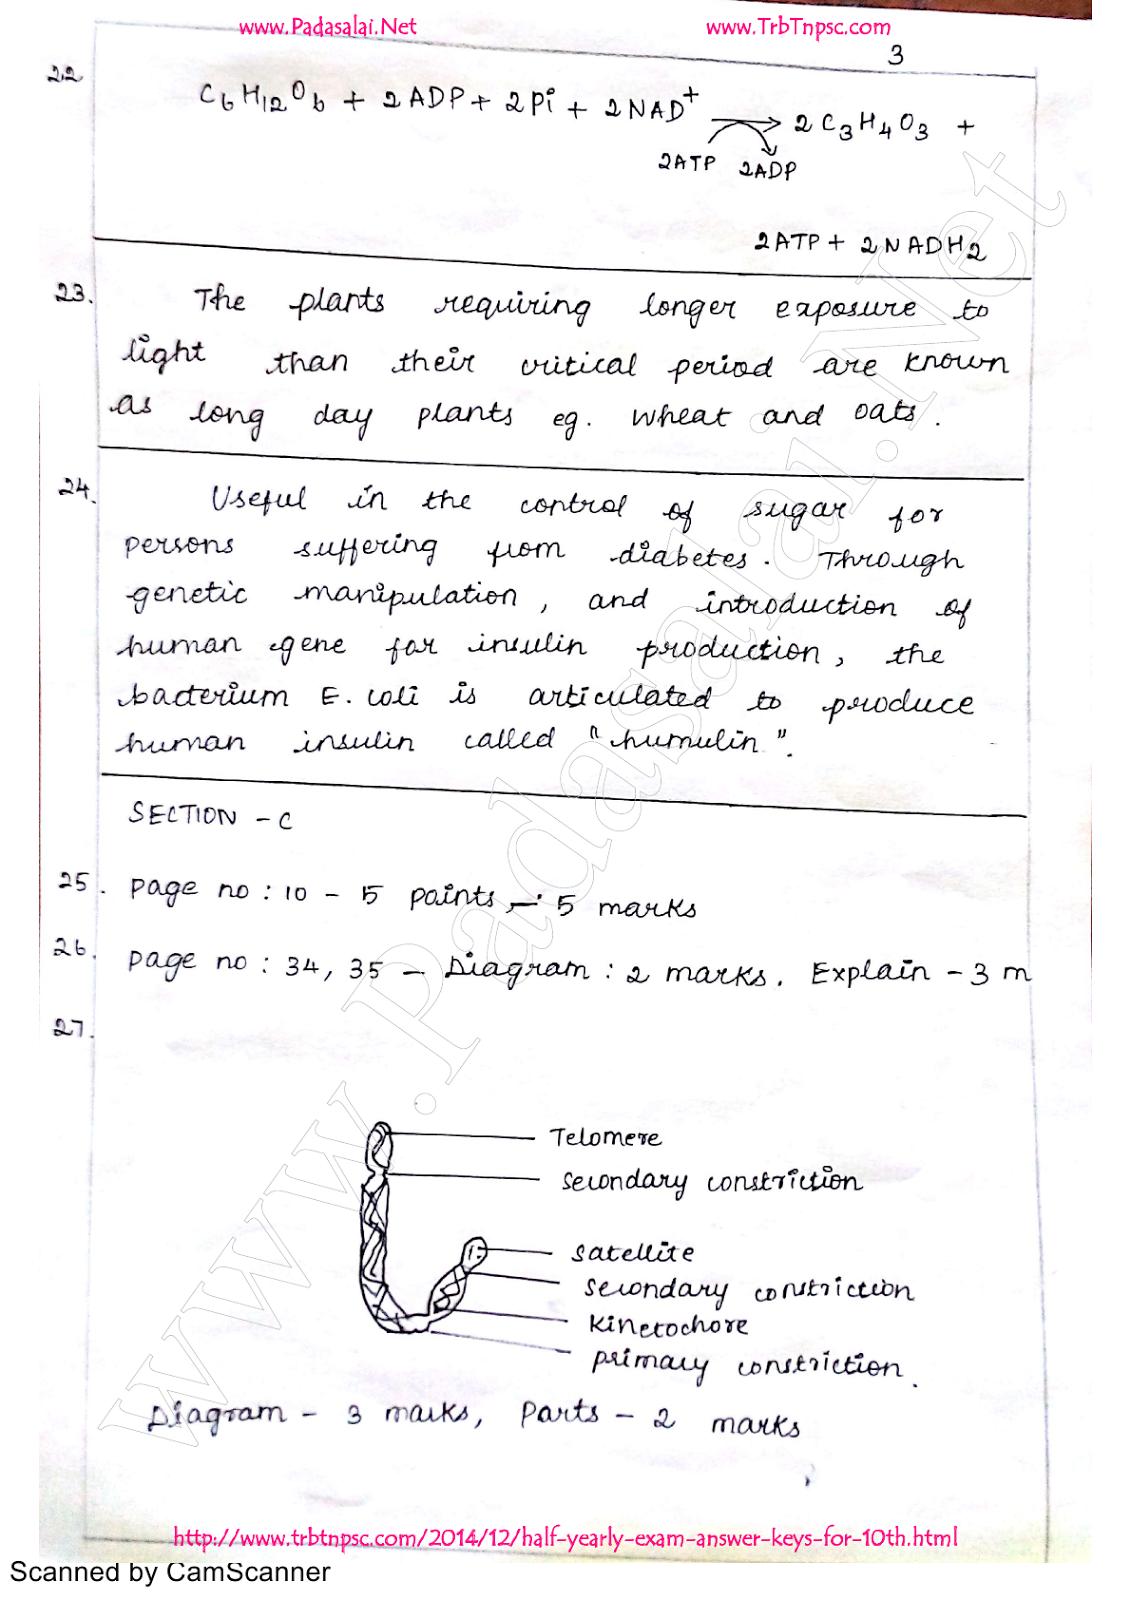 12th Bio-Botany | Half Yearly Exam Answer Key - English Medium